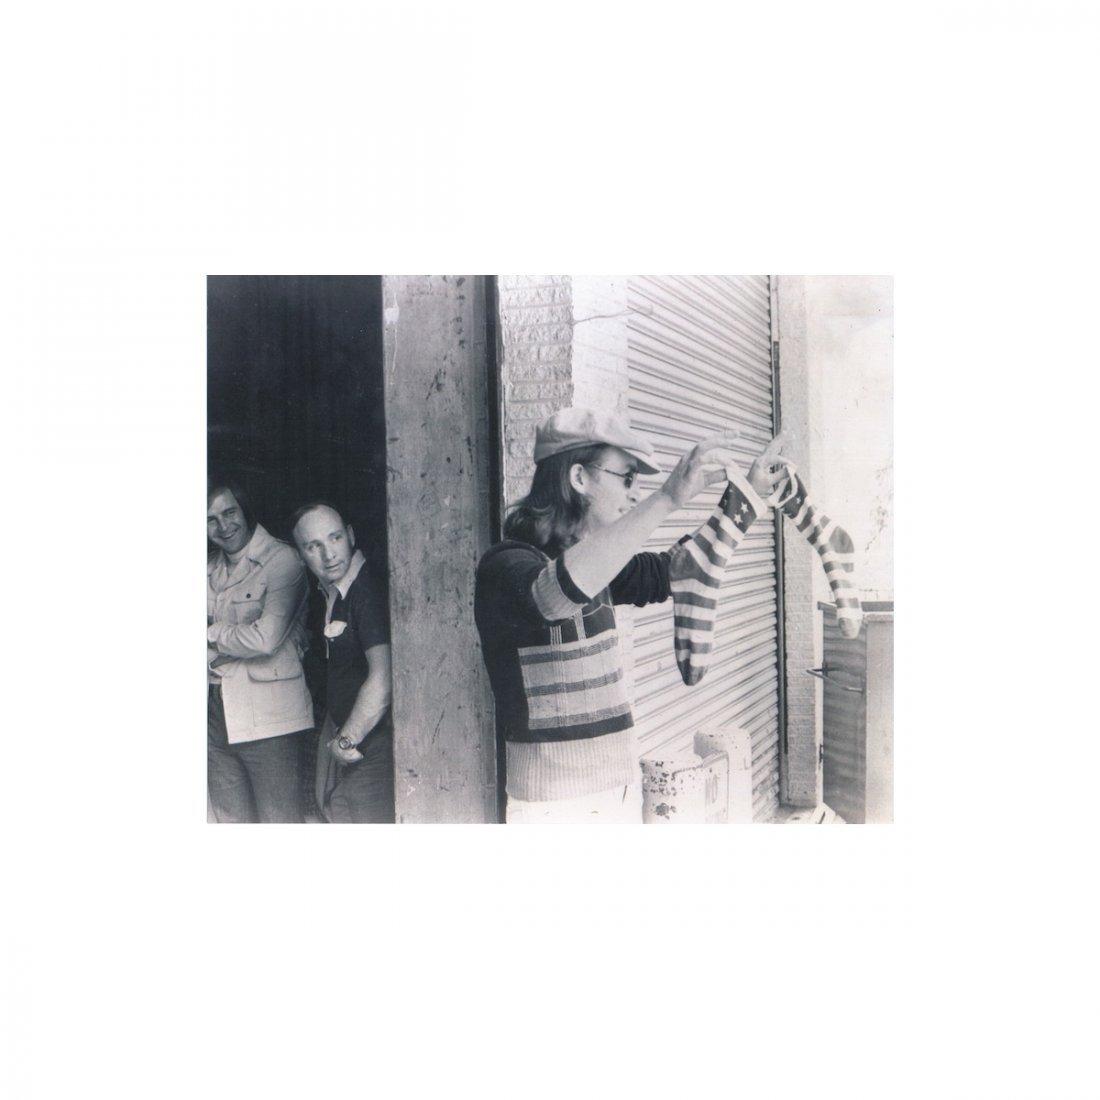 John Lennon - WFIL Helping Hand Marathon - 1975 Flyer - 2